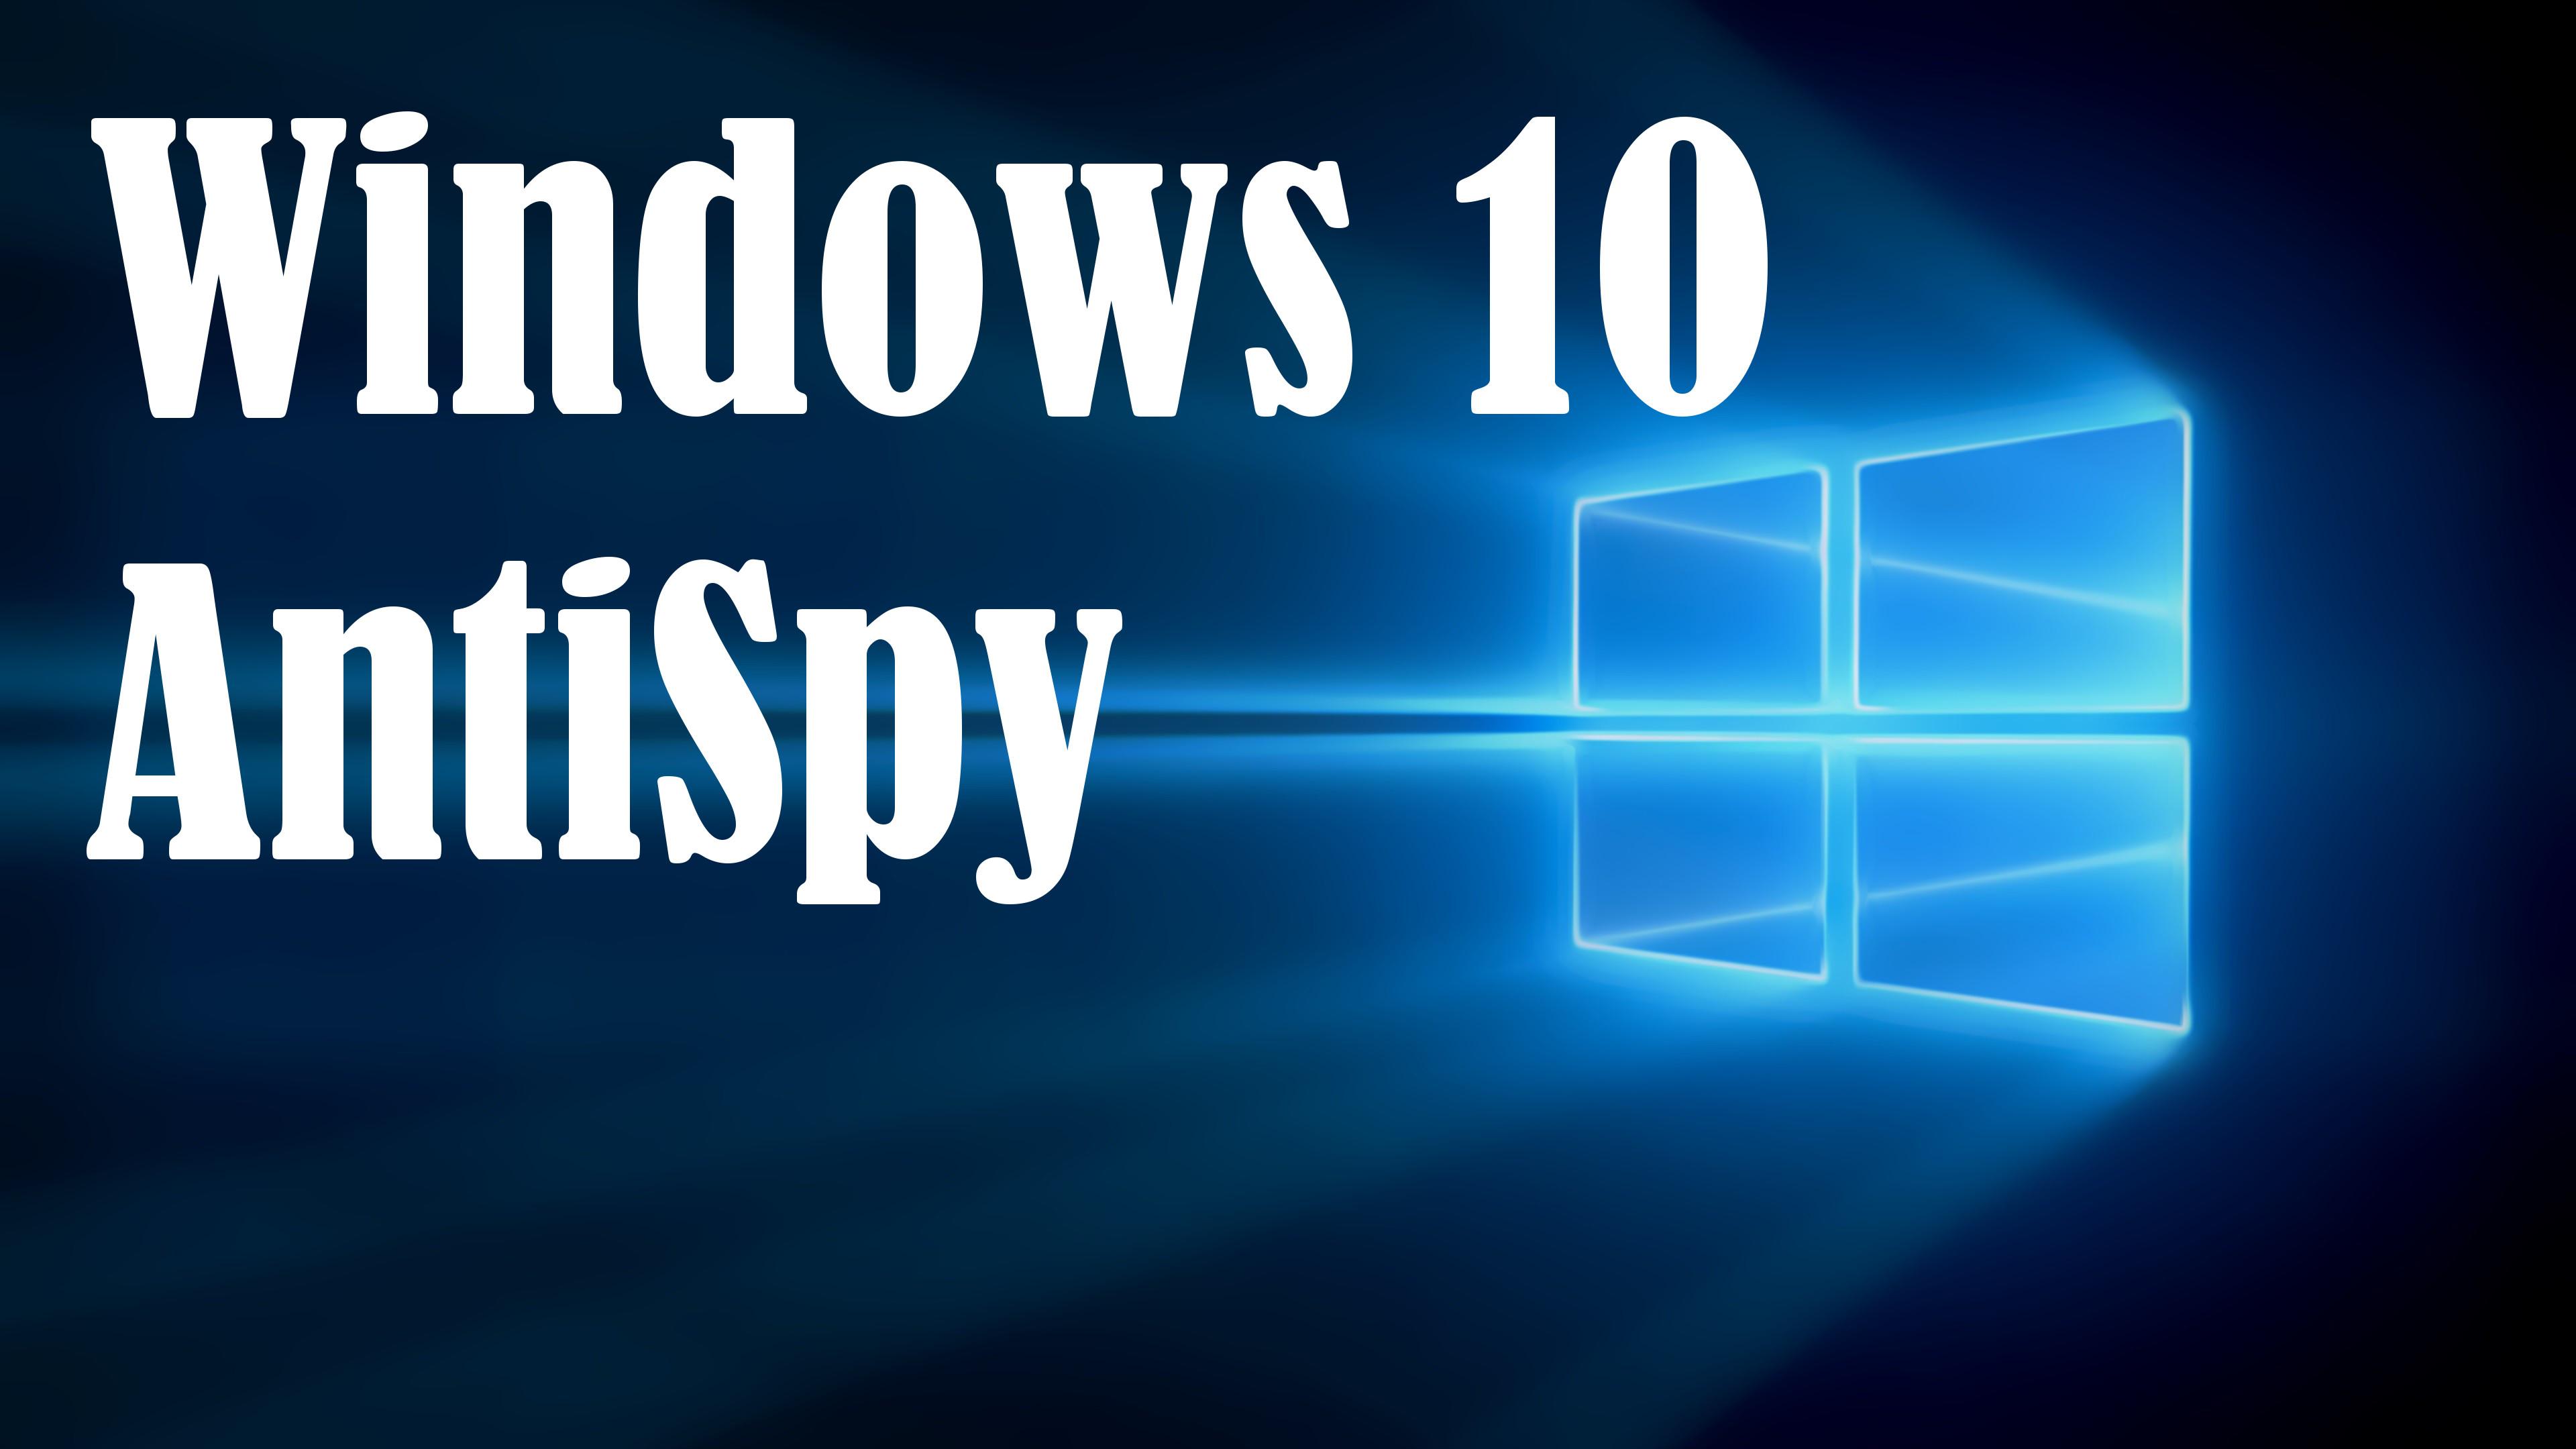 Windows 10 Donotspy